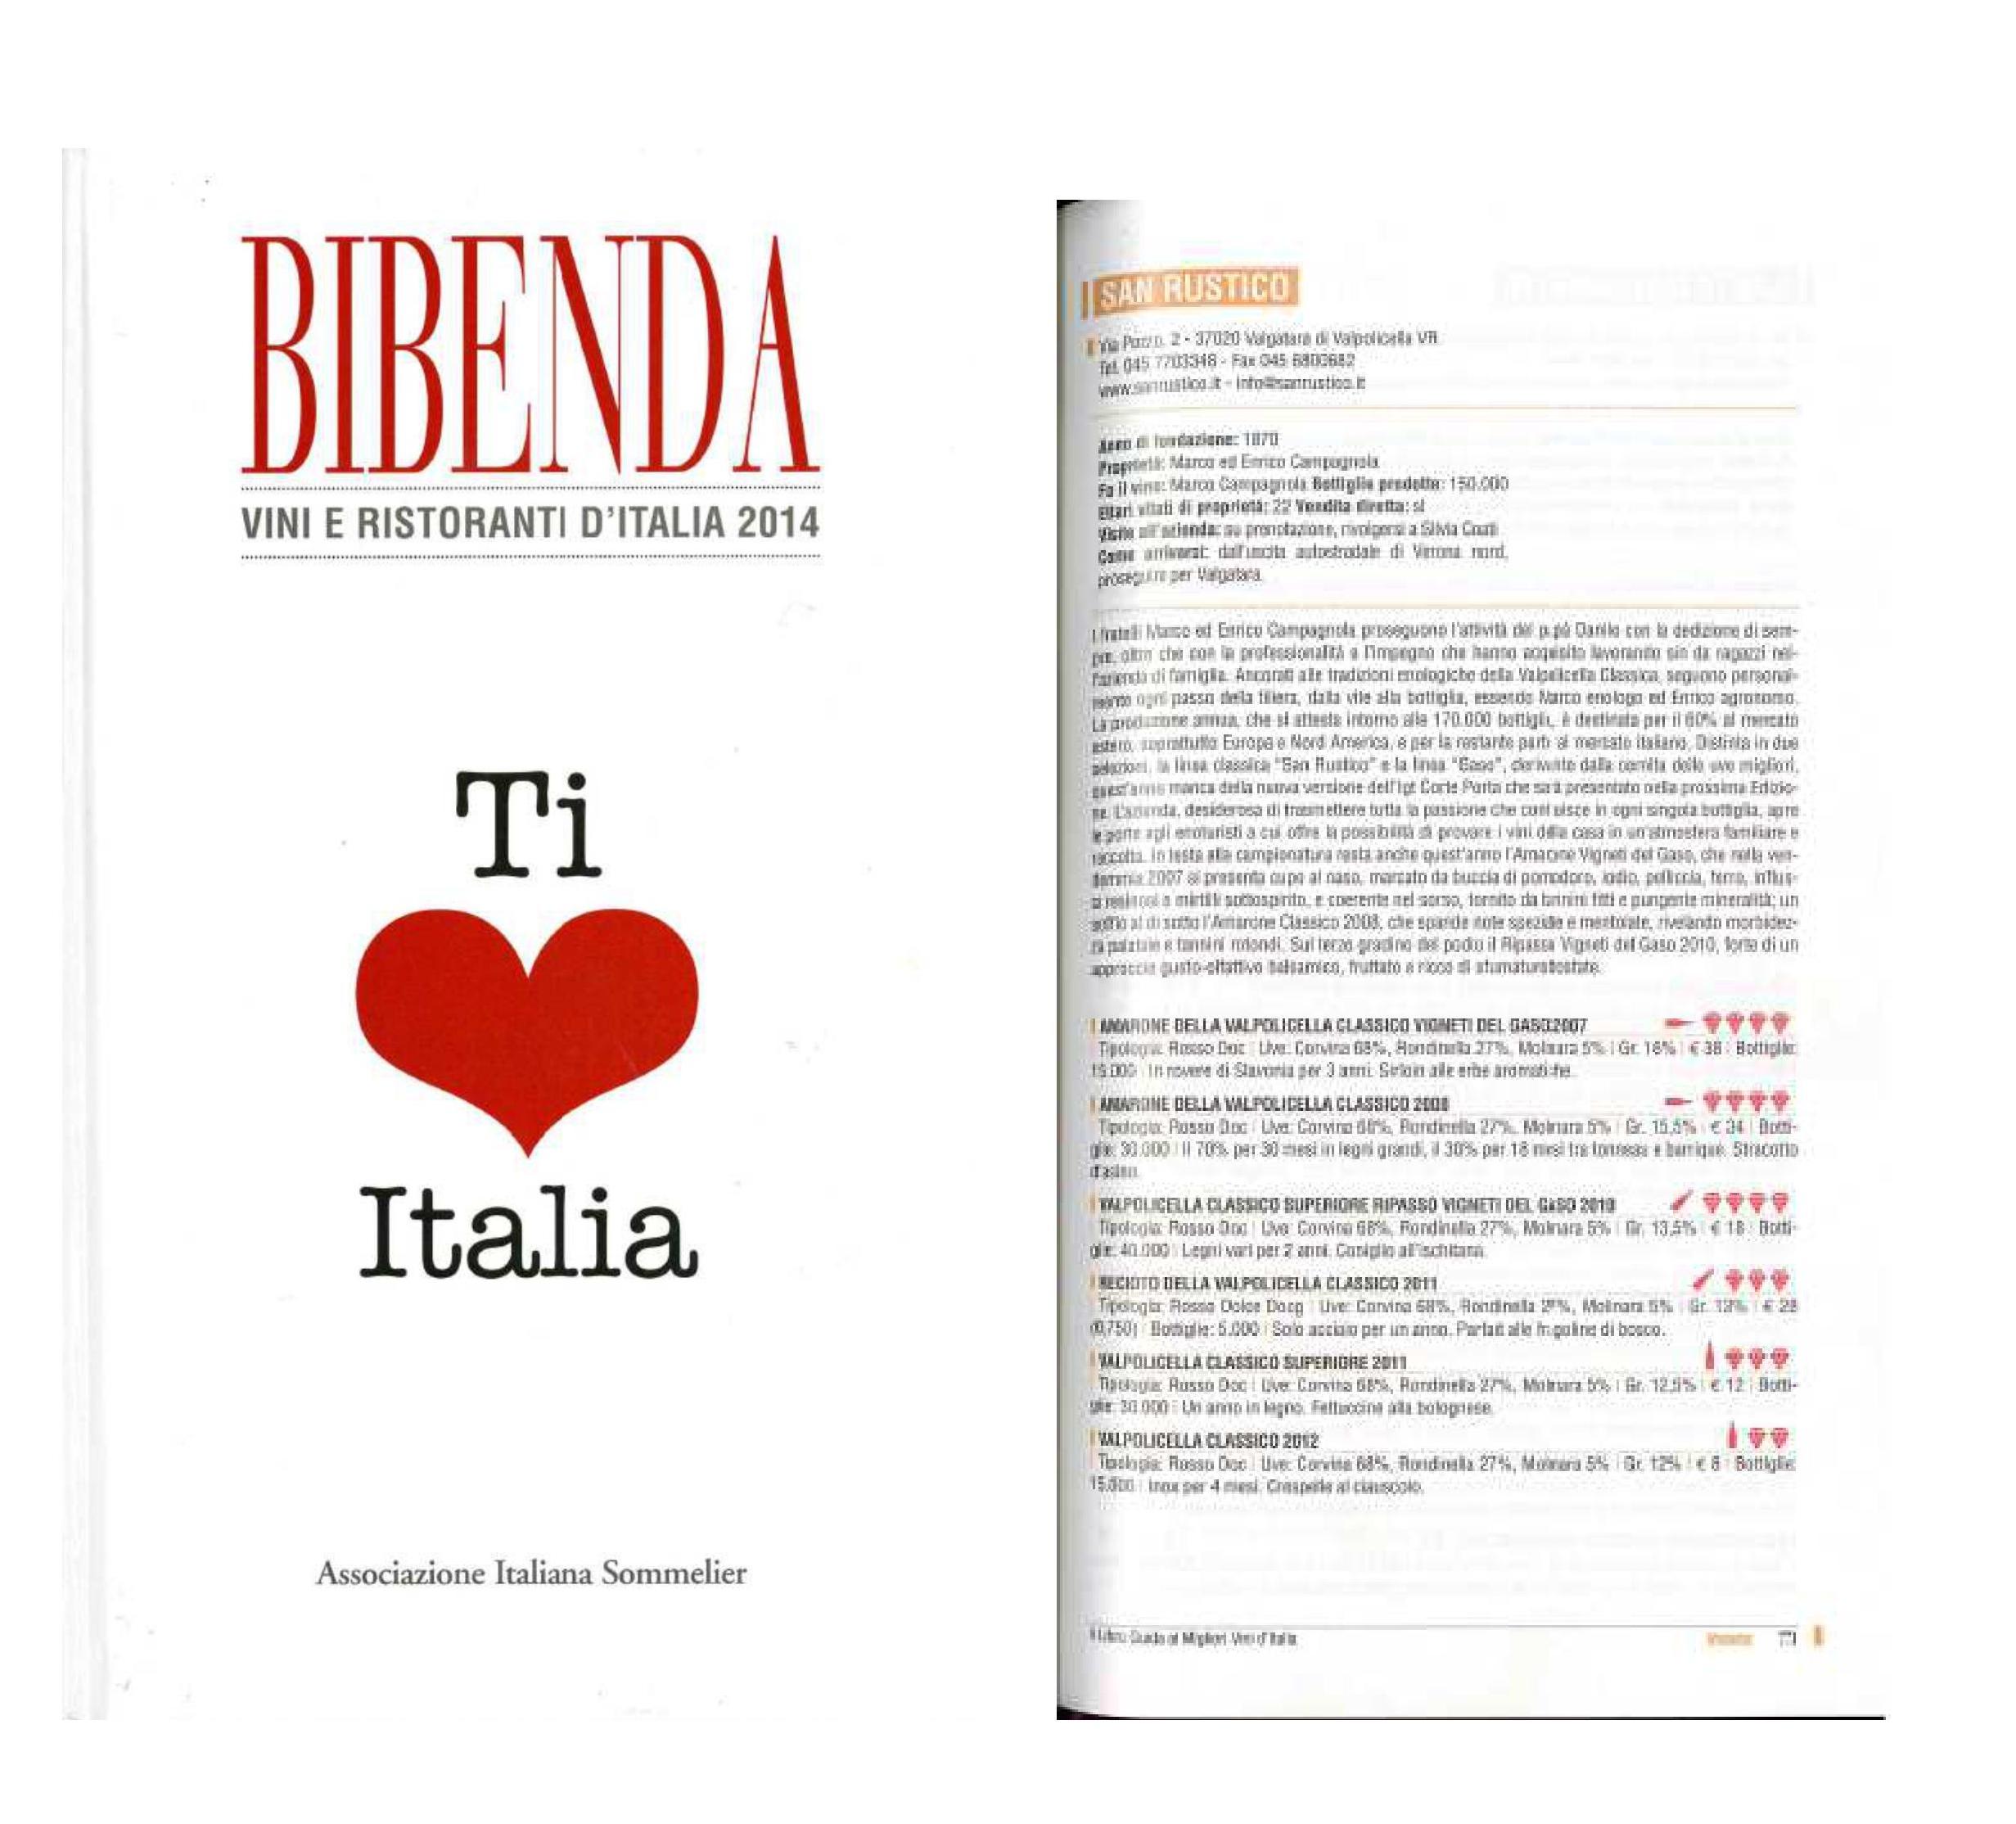 Bibenda 2014 - Associazione Italiana Sommelier